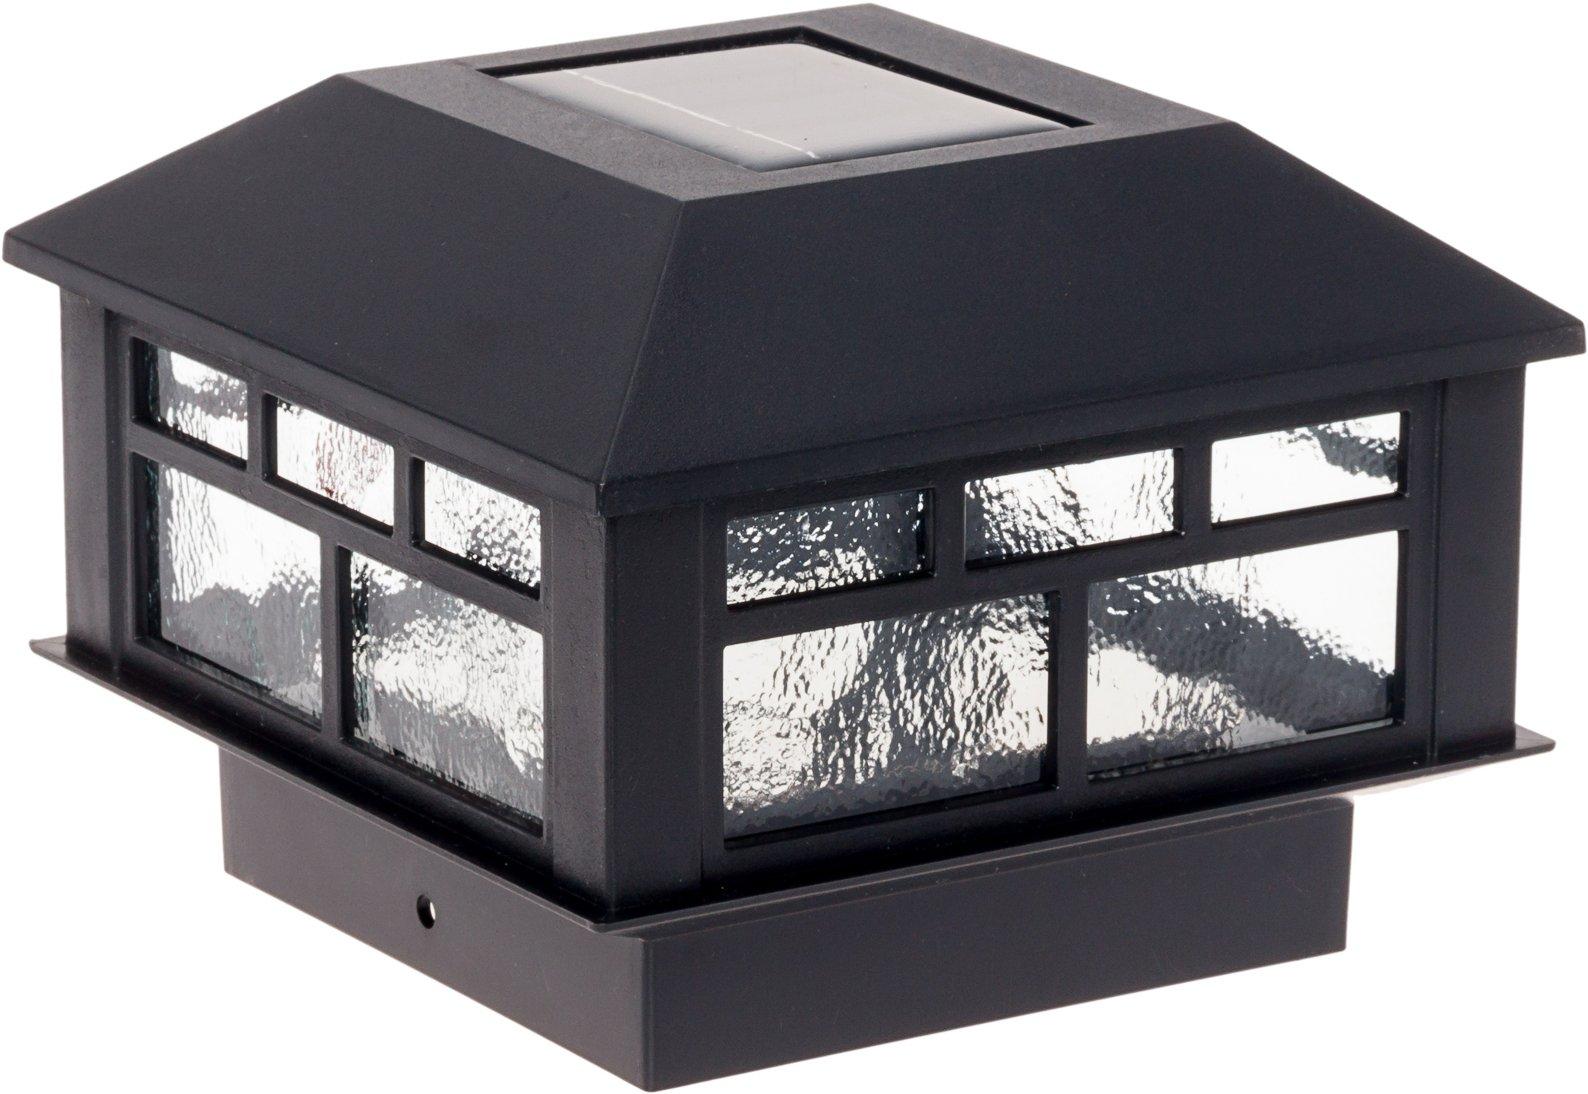 GreenLighting Modern Design Solar Powered Post Cap Light by for 4x4 Wood Posts (Black)